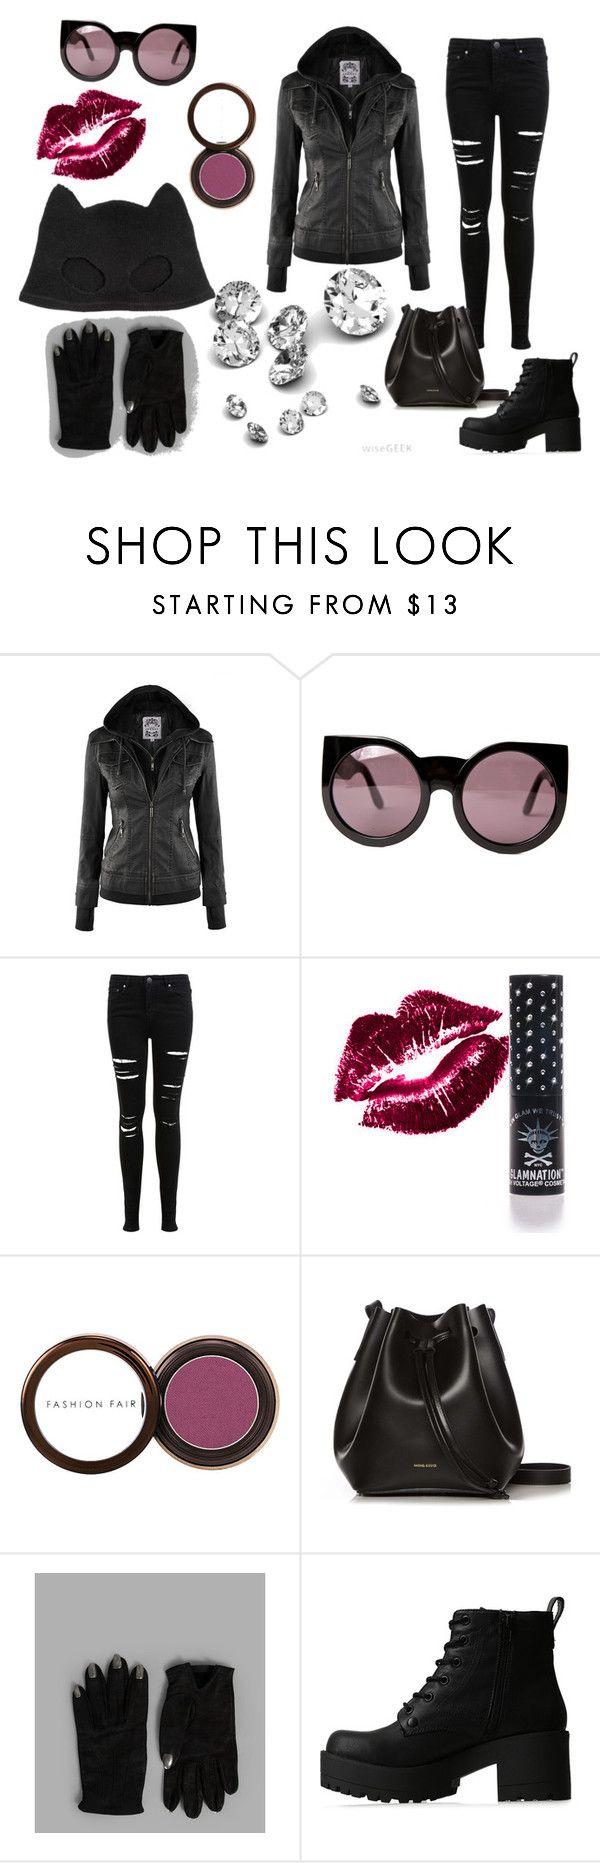 """Catwoman outfit"" by chiroptera-nyxx ❤ liked on Polyvore featuring Wildfox, Miss Selfridge, Manic Panic NYC, Fashion Fair, Rachael Ruddick, Majesty Black, Lipstik, Silver Spoon Attire, meow and diamonds"